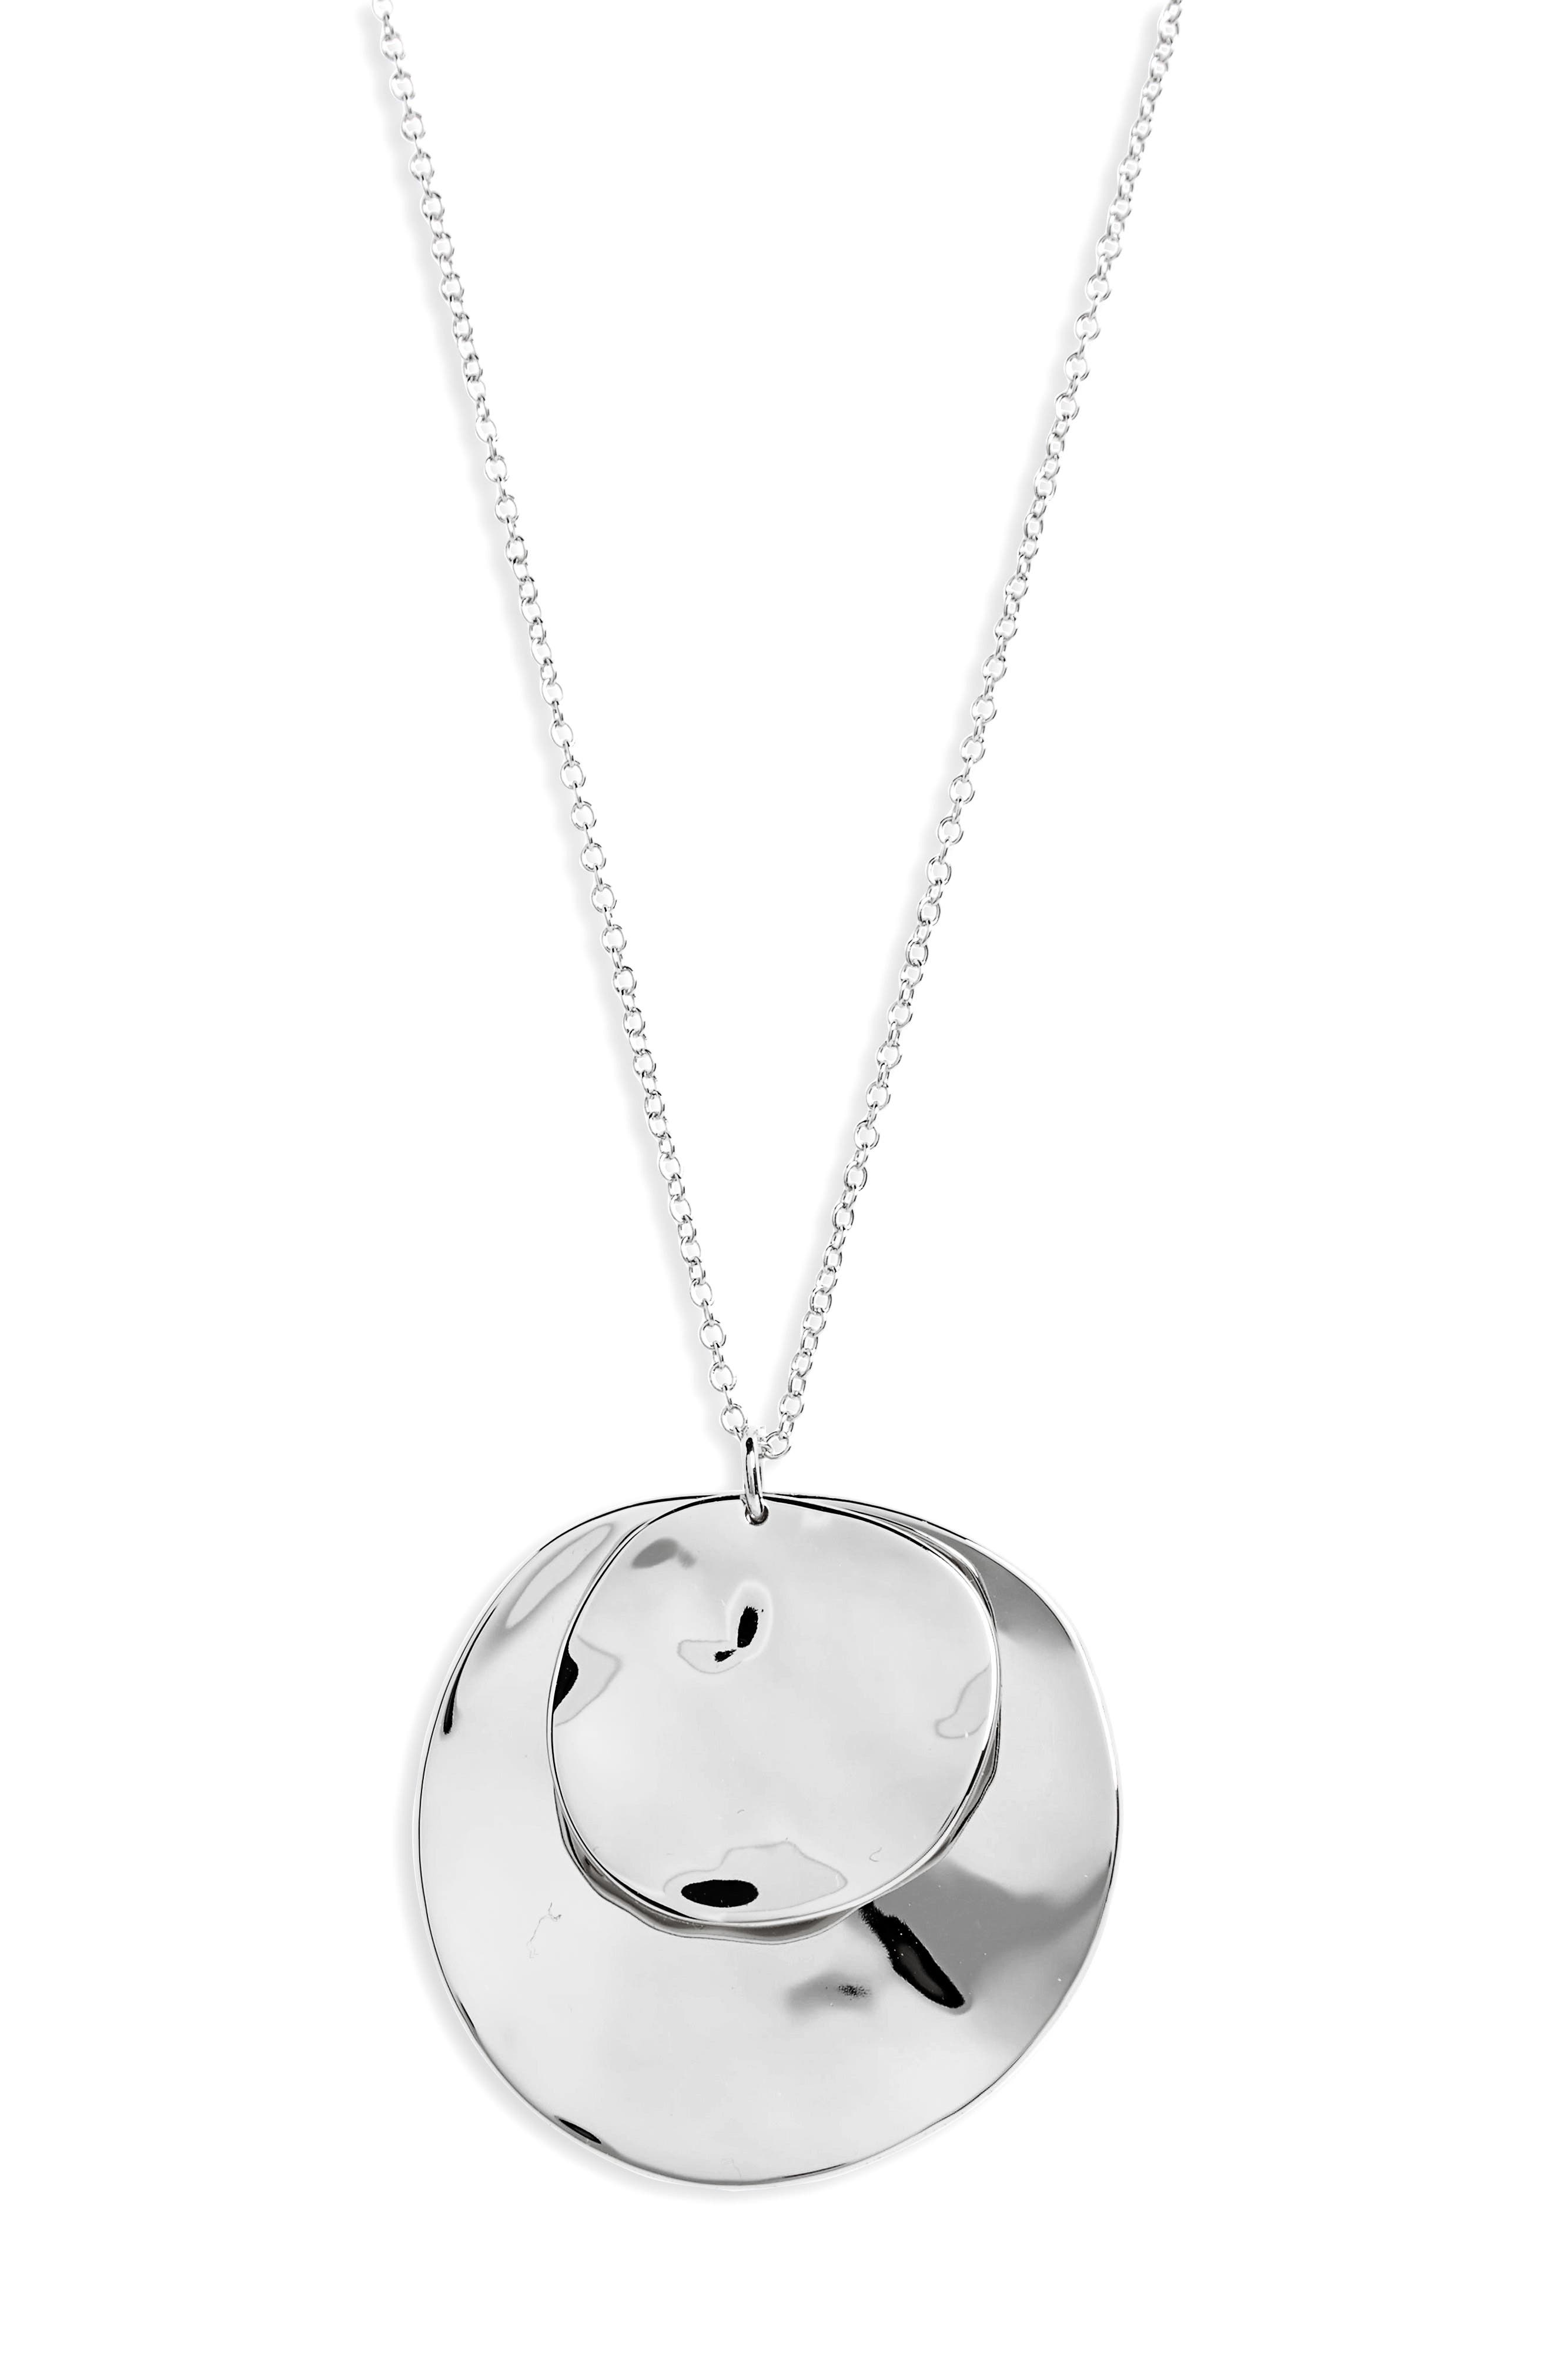 Chloe Long Cluster Pendant Necklace,                             Alternate thumbnail 2, color,                             Silver